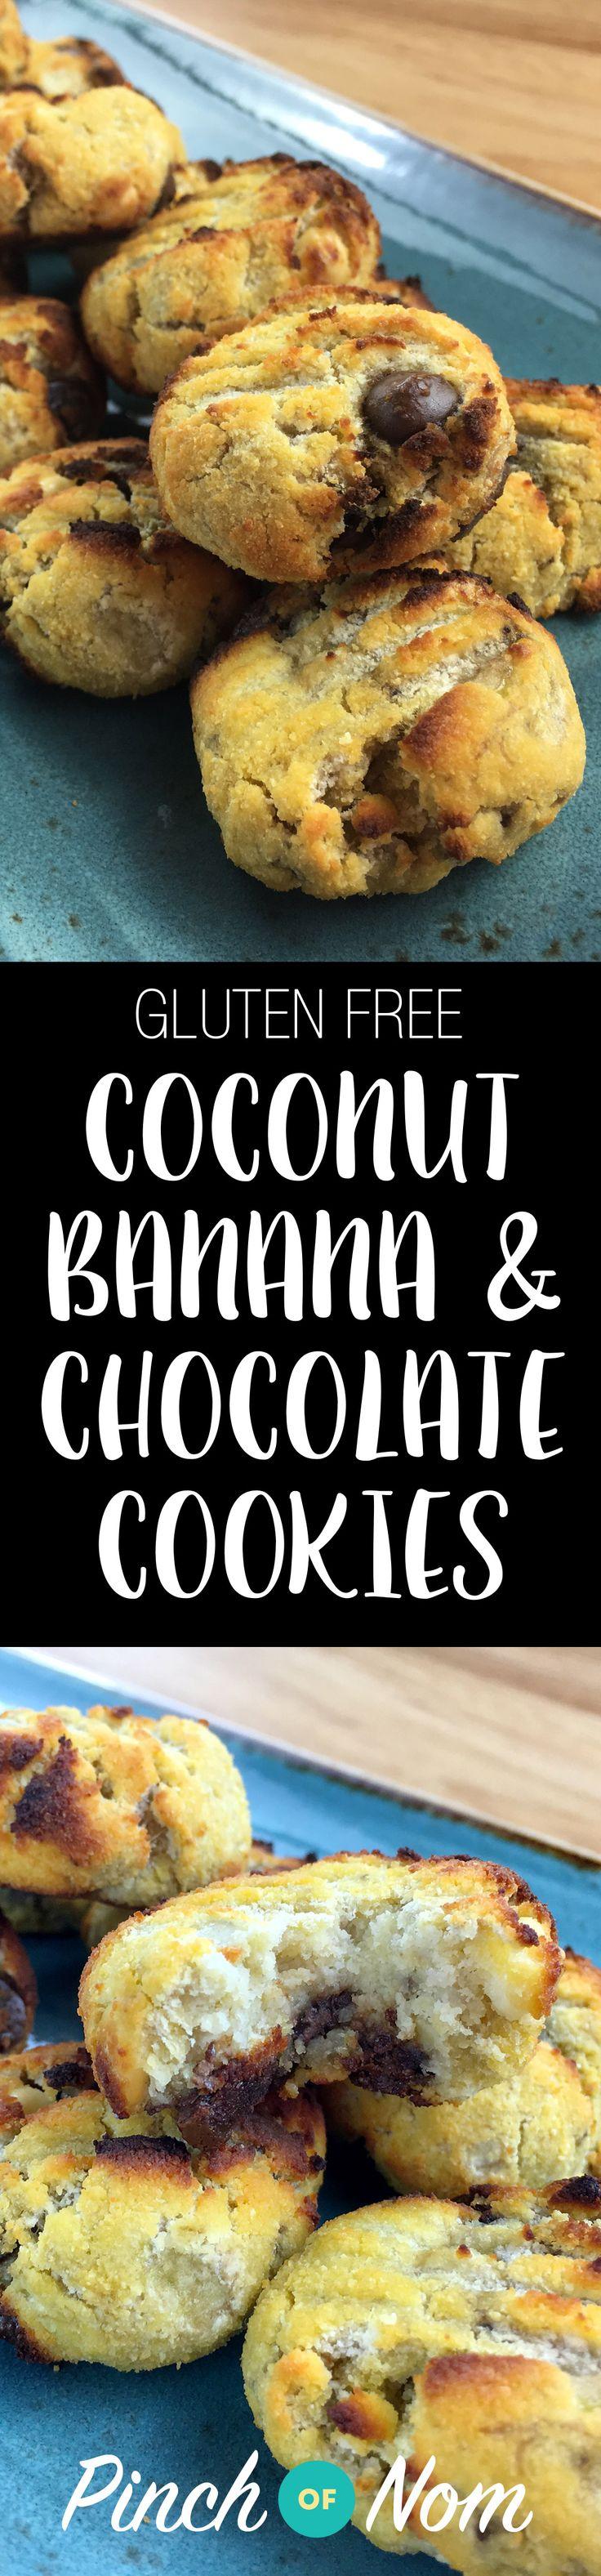 Gluten Free Coconut, Banana & Chocolate Chip Cookies | Slimming World